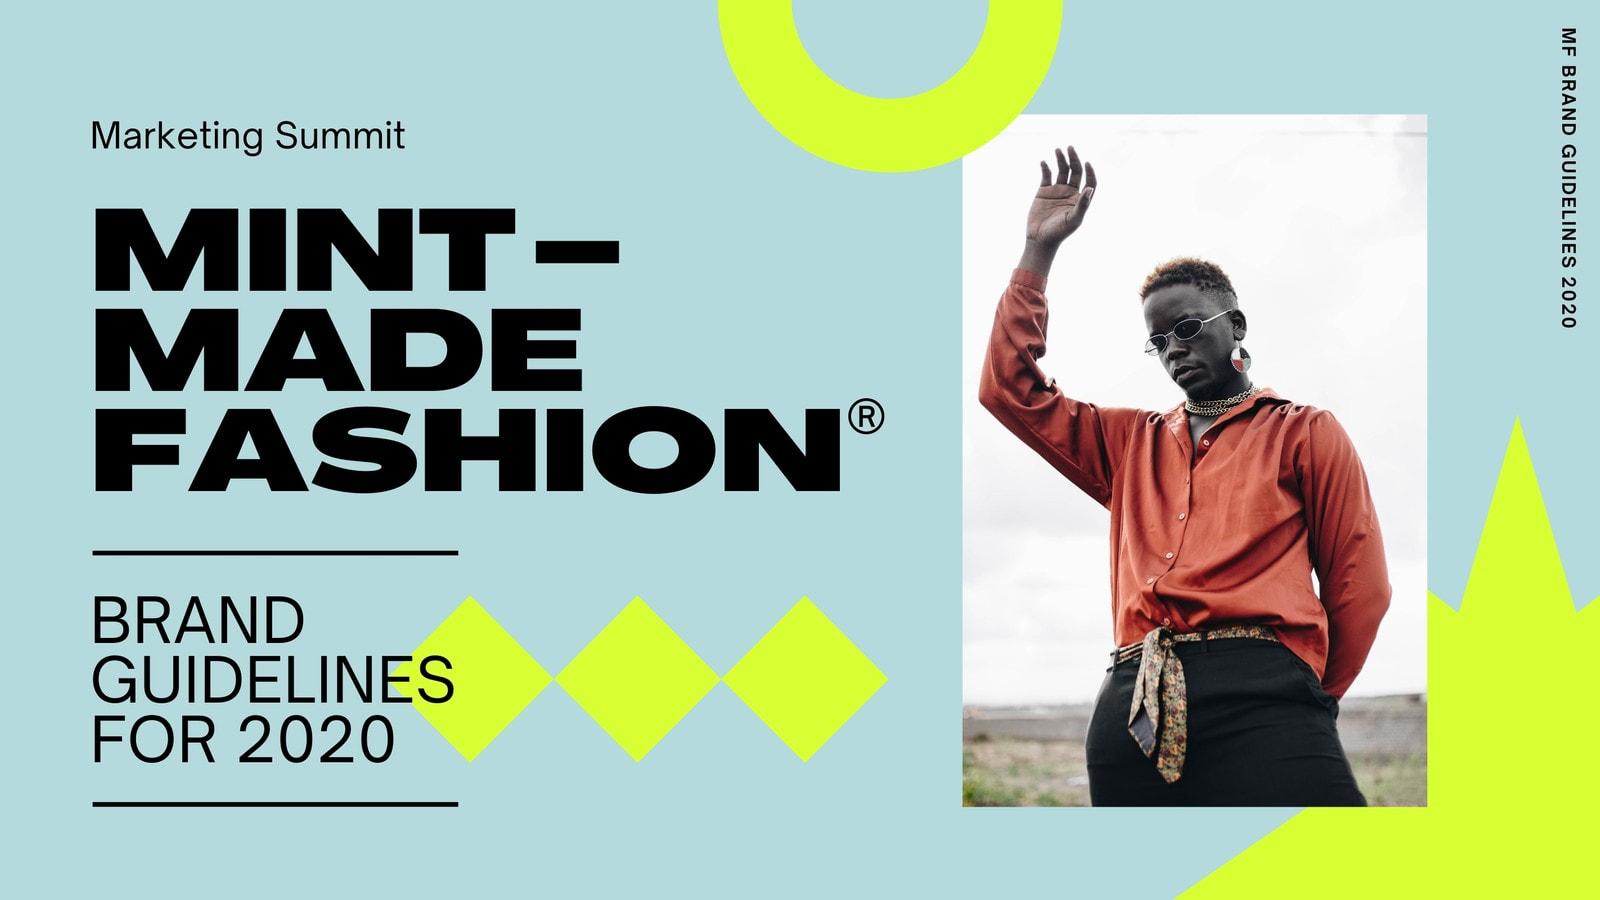 Mint Neon Experimental Fashion Brand Guidelines Video Presentation